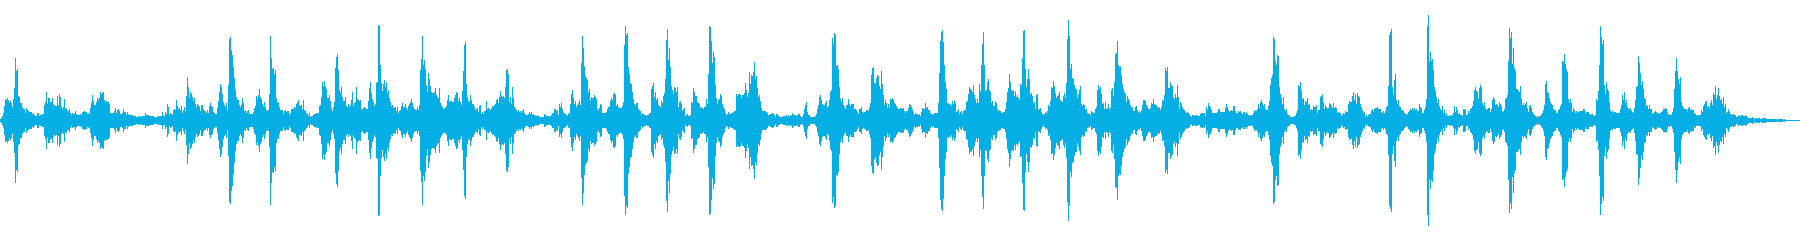 SLEIGH BELLS:連続ラン...の再生済みの波形